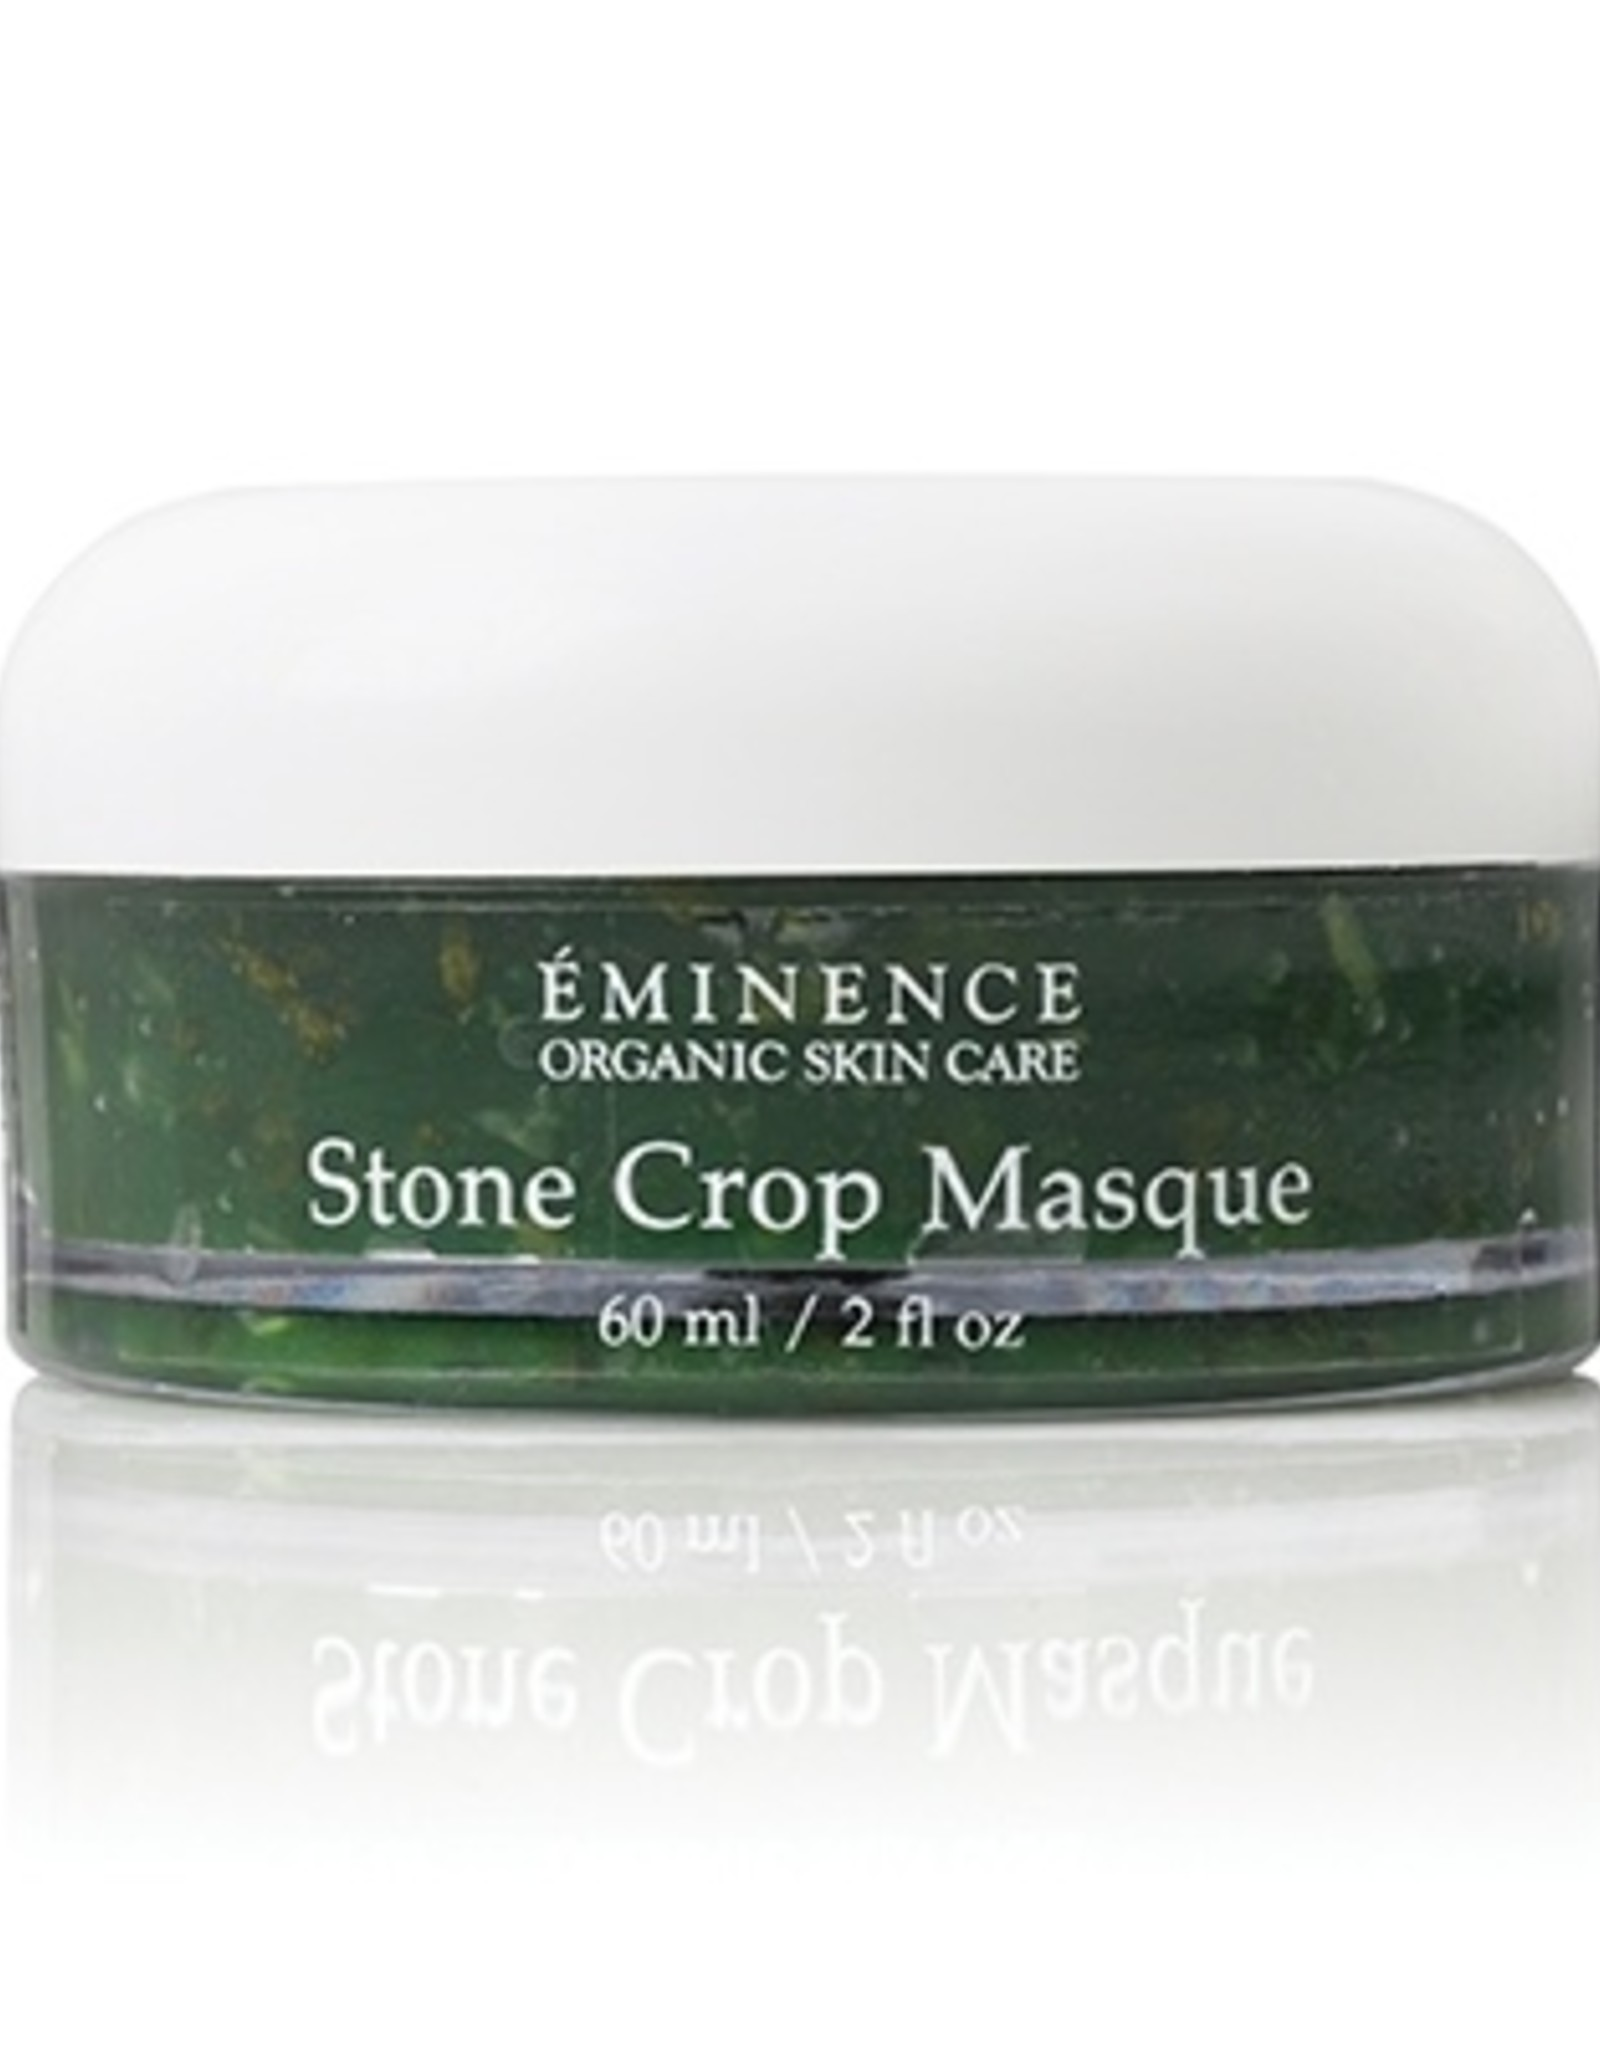 Eminence Organic Skin Care Stone Crop Masque